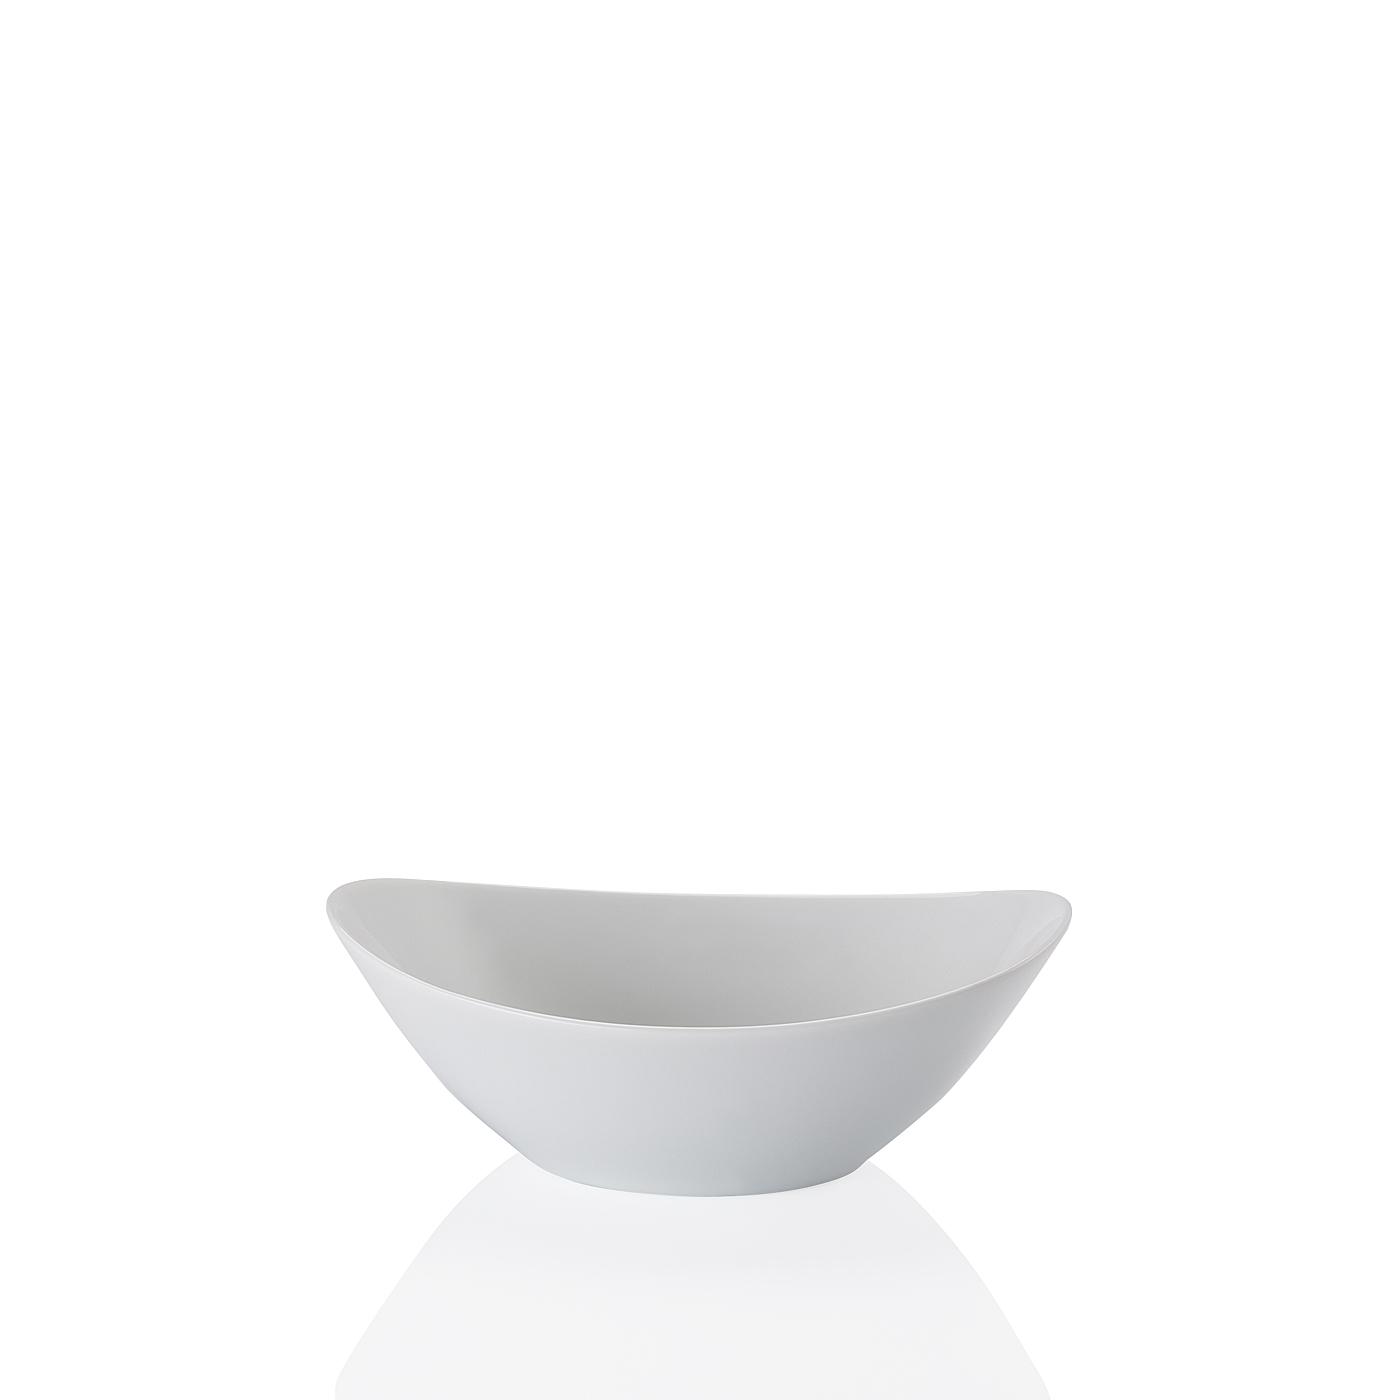 Schale oval 20 cm Form 2000 Weiss Arzberg